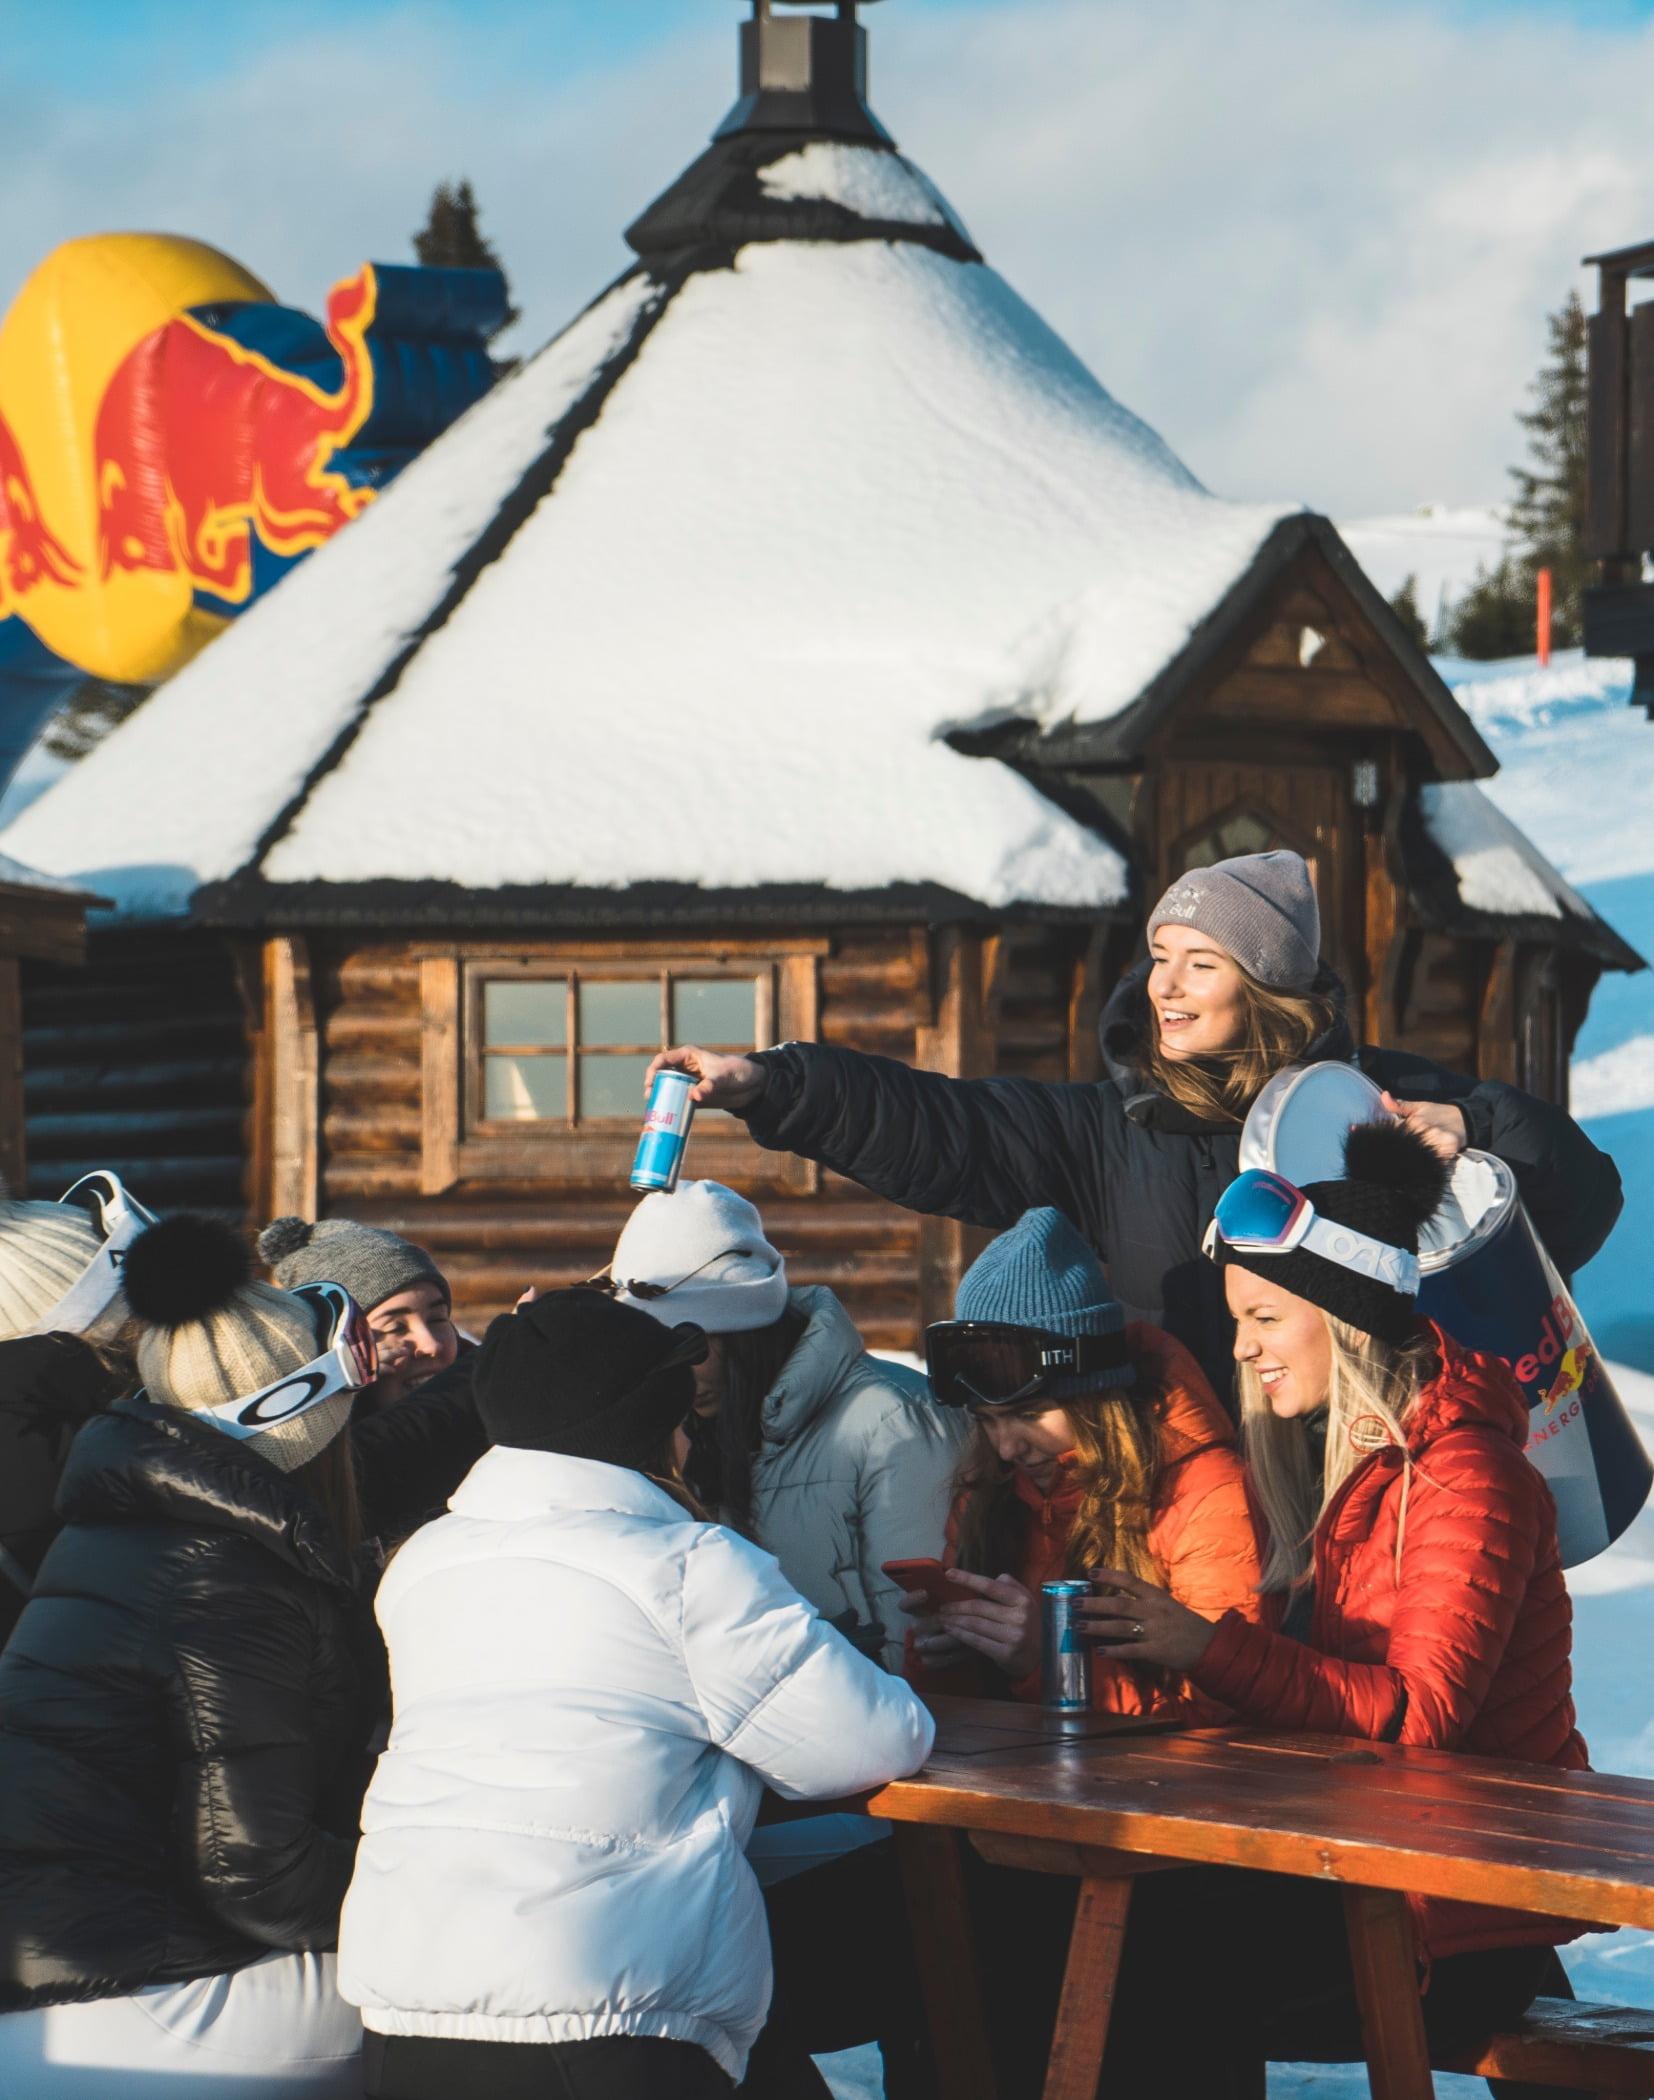 Snow, Hat, Winter